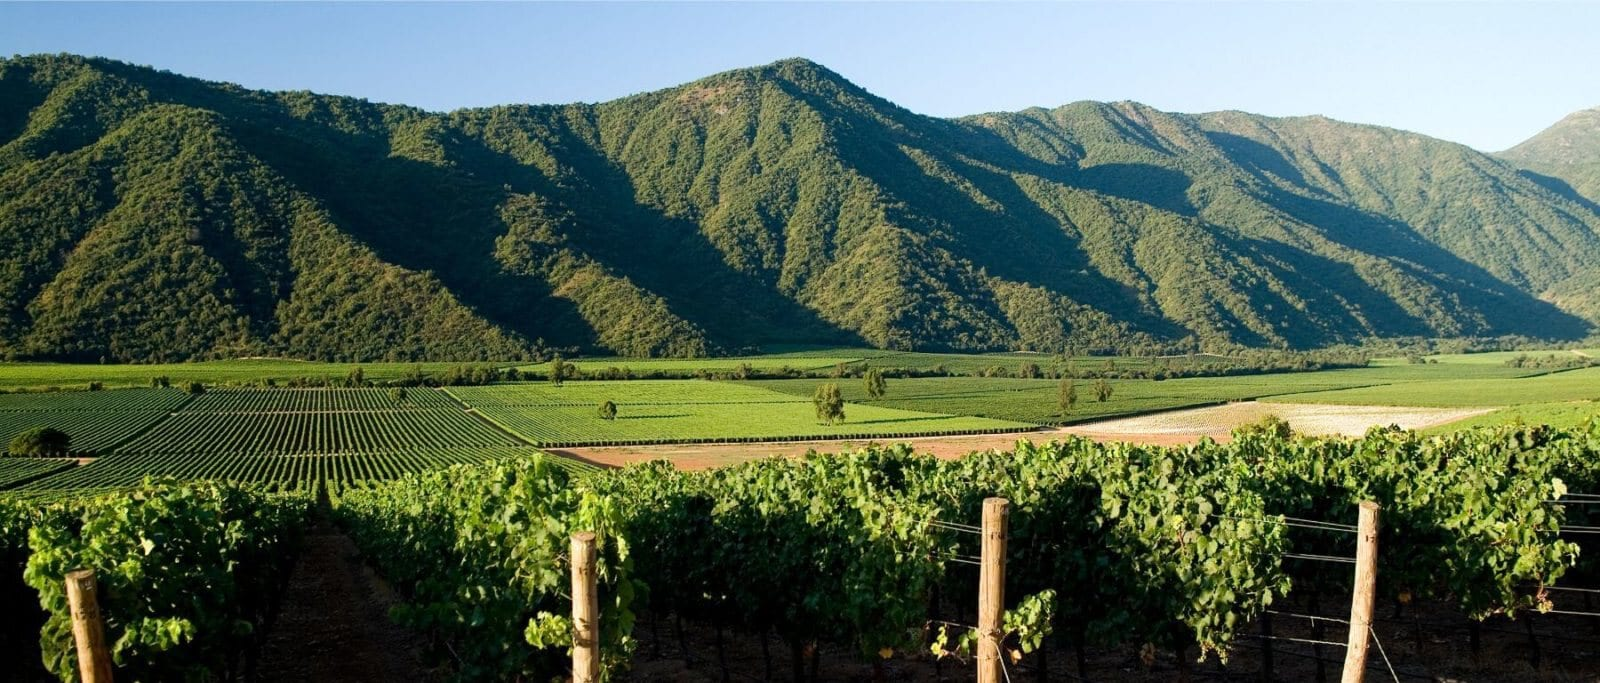 Veramonte Vineyards, Chile